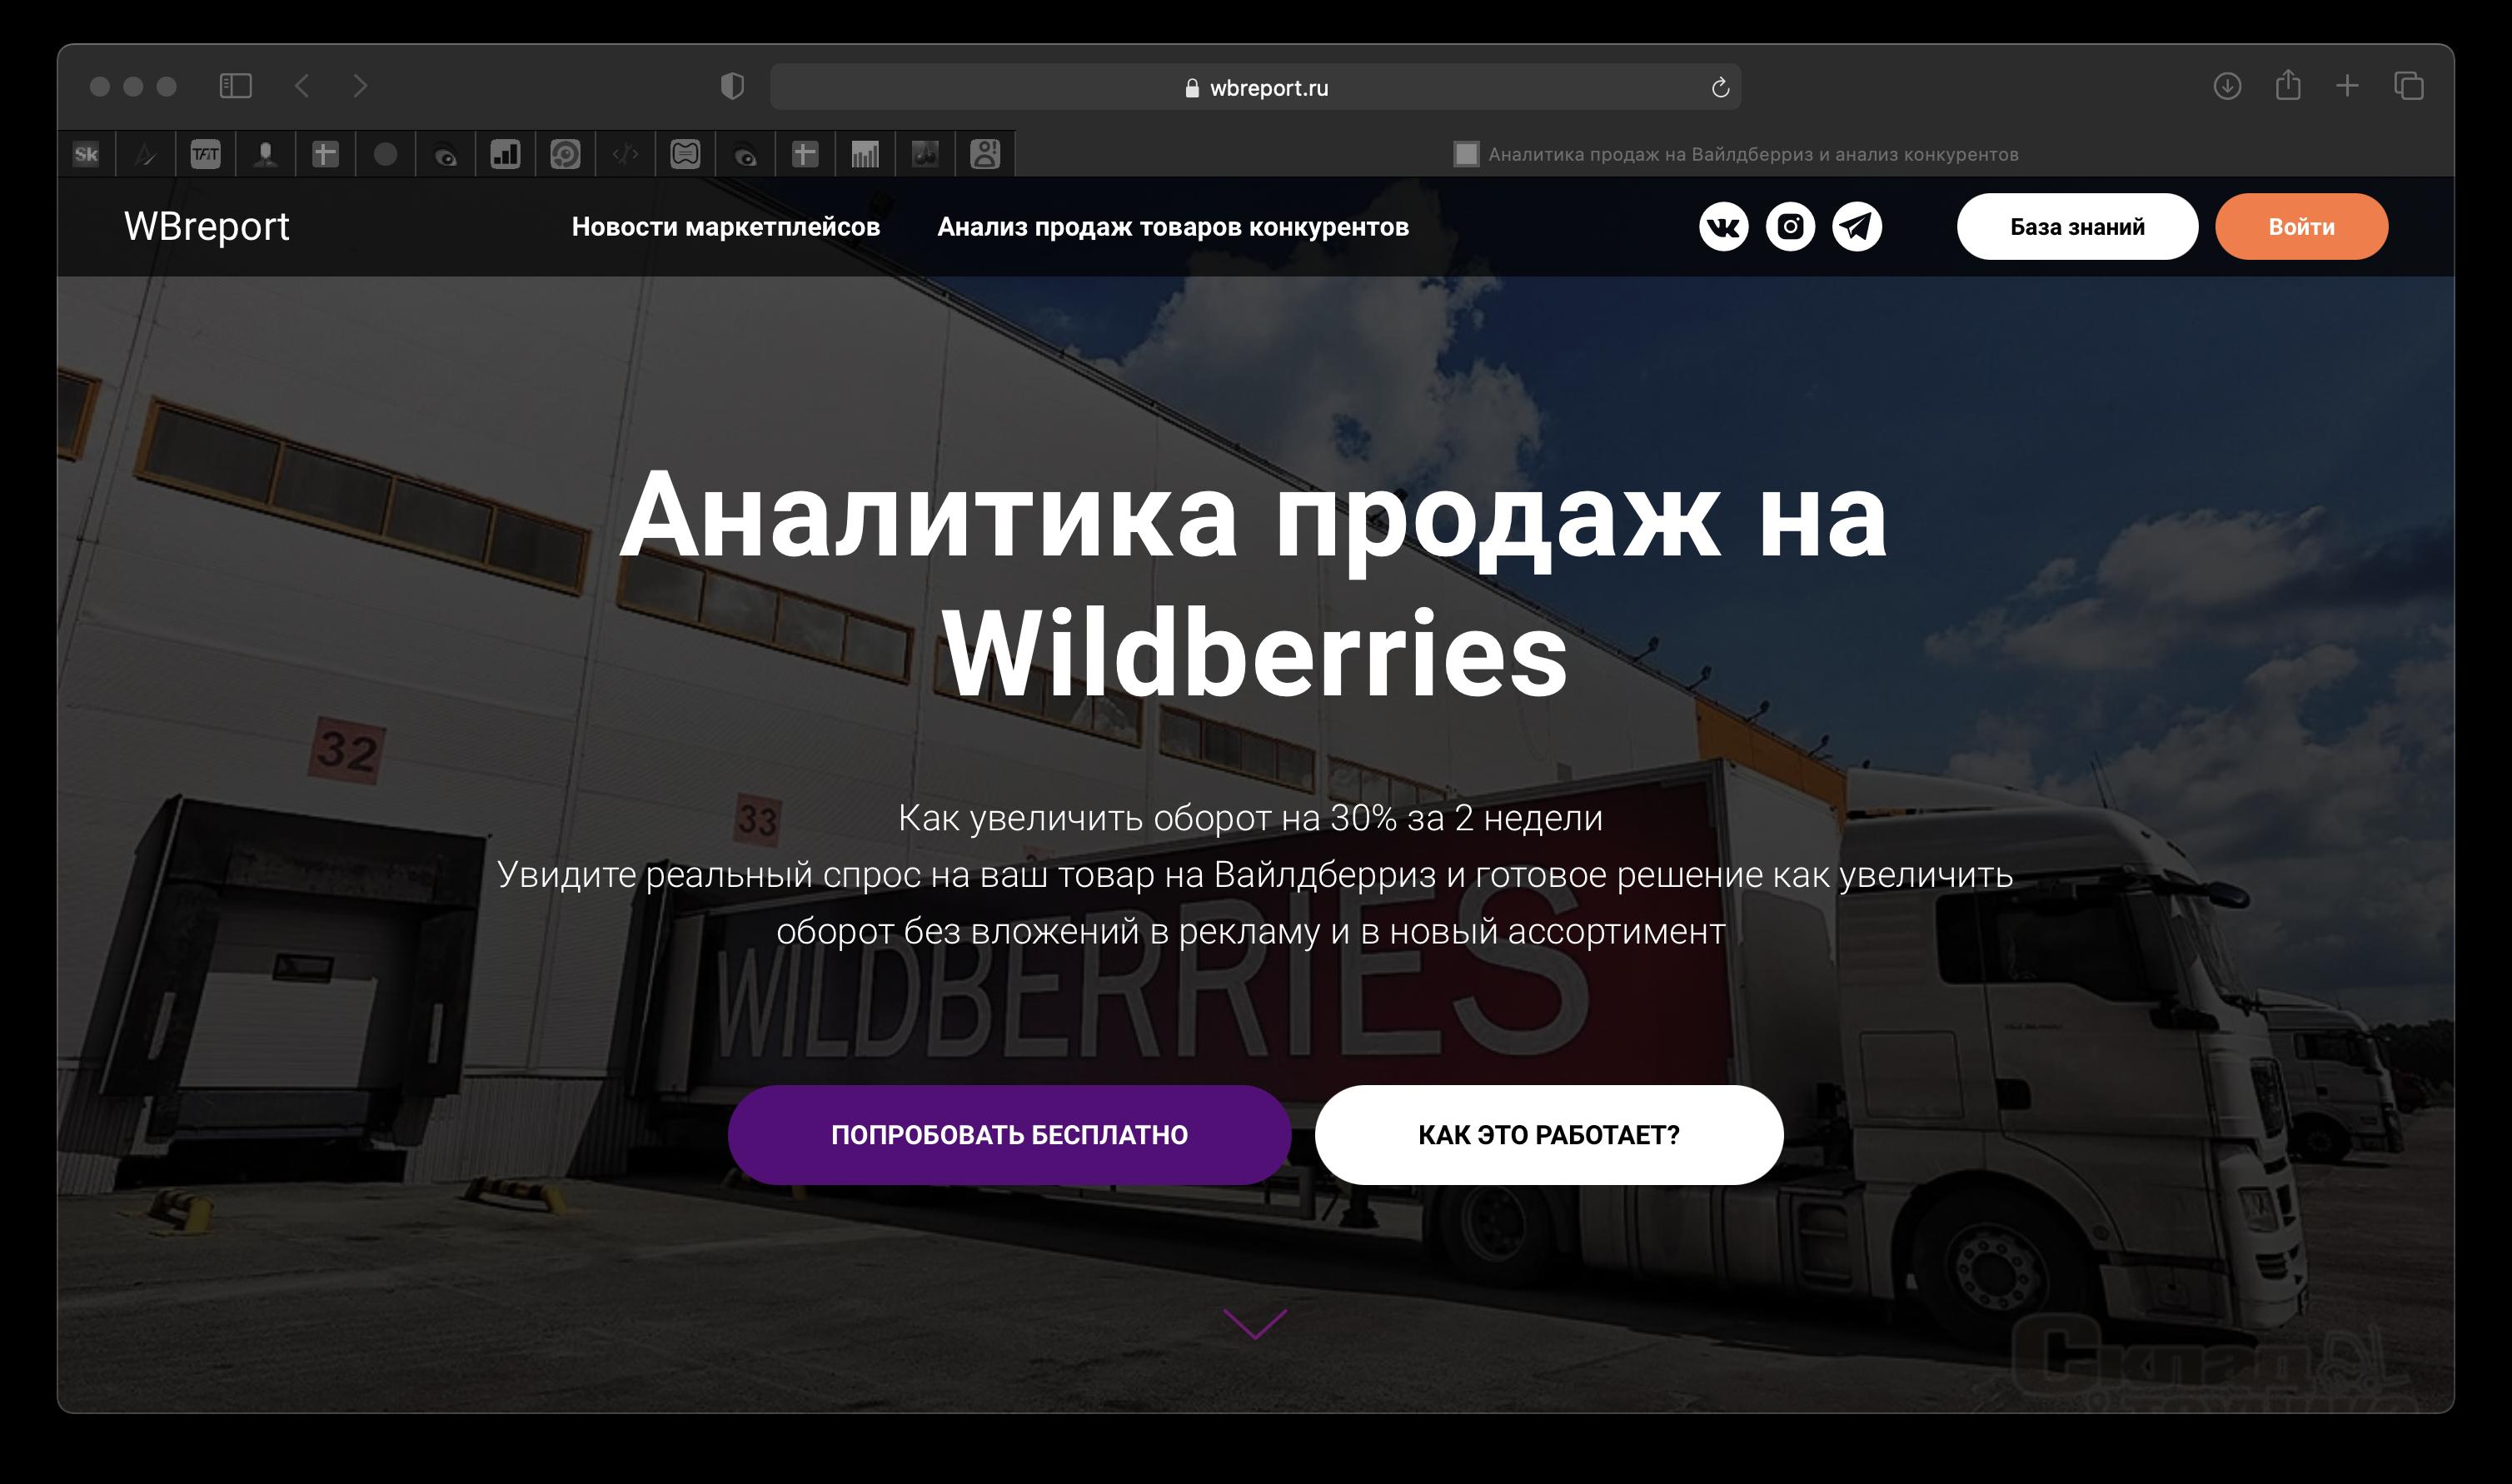 сайт аналитики продаж и конкурентов на wildberries